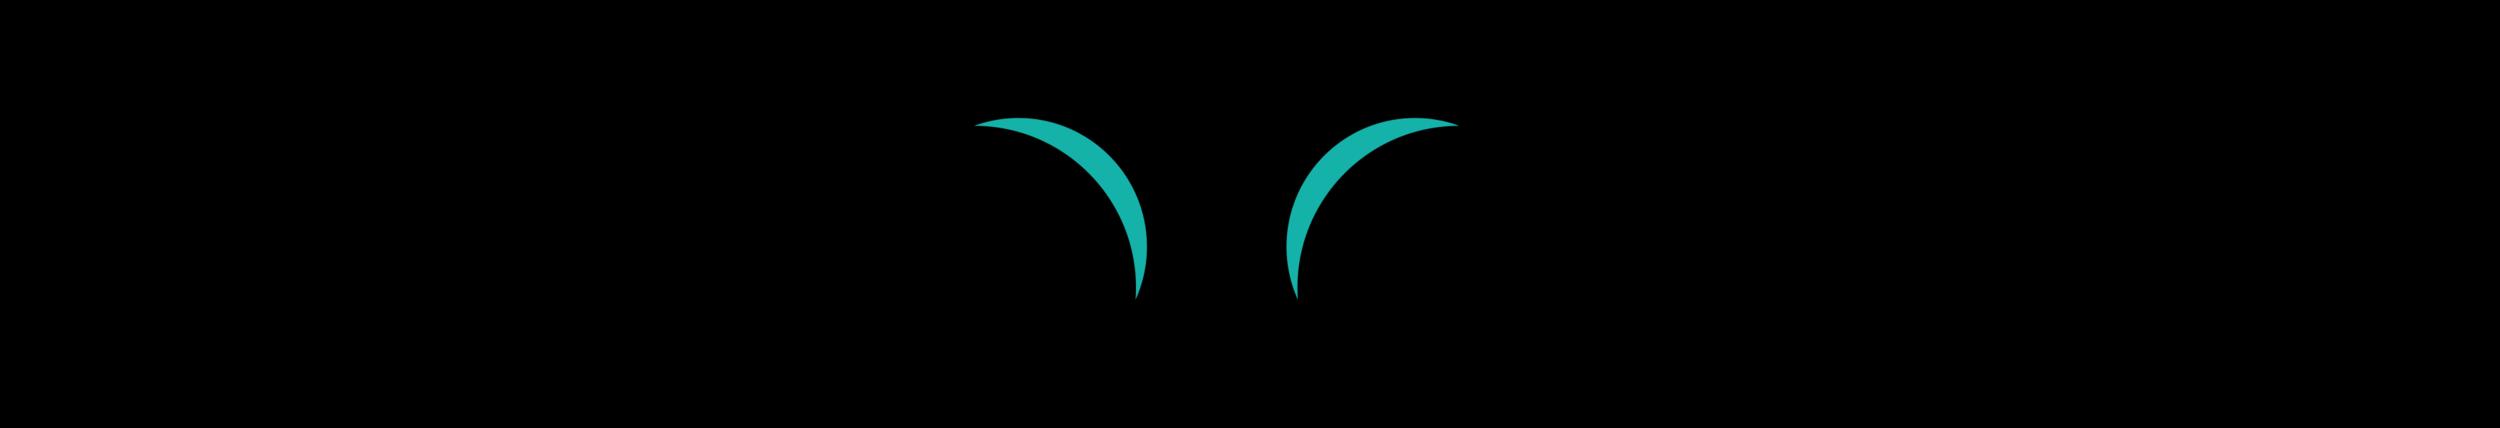 Ambidextr_logo_positive.png